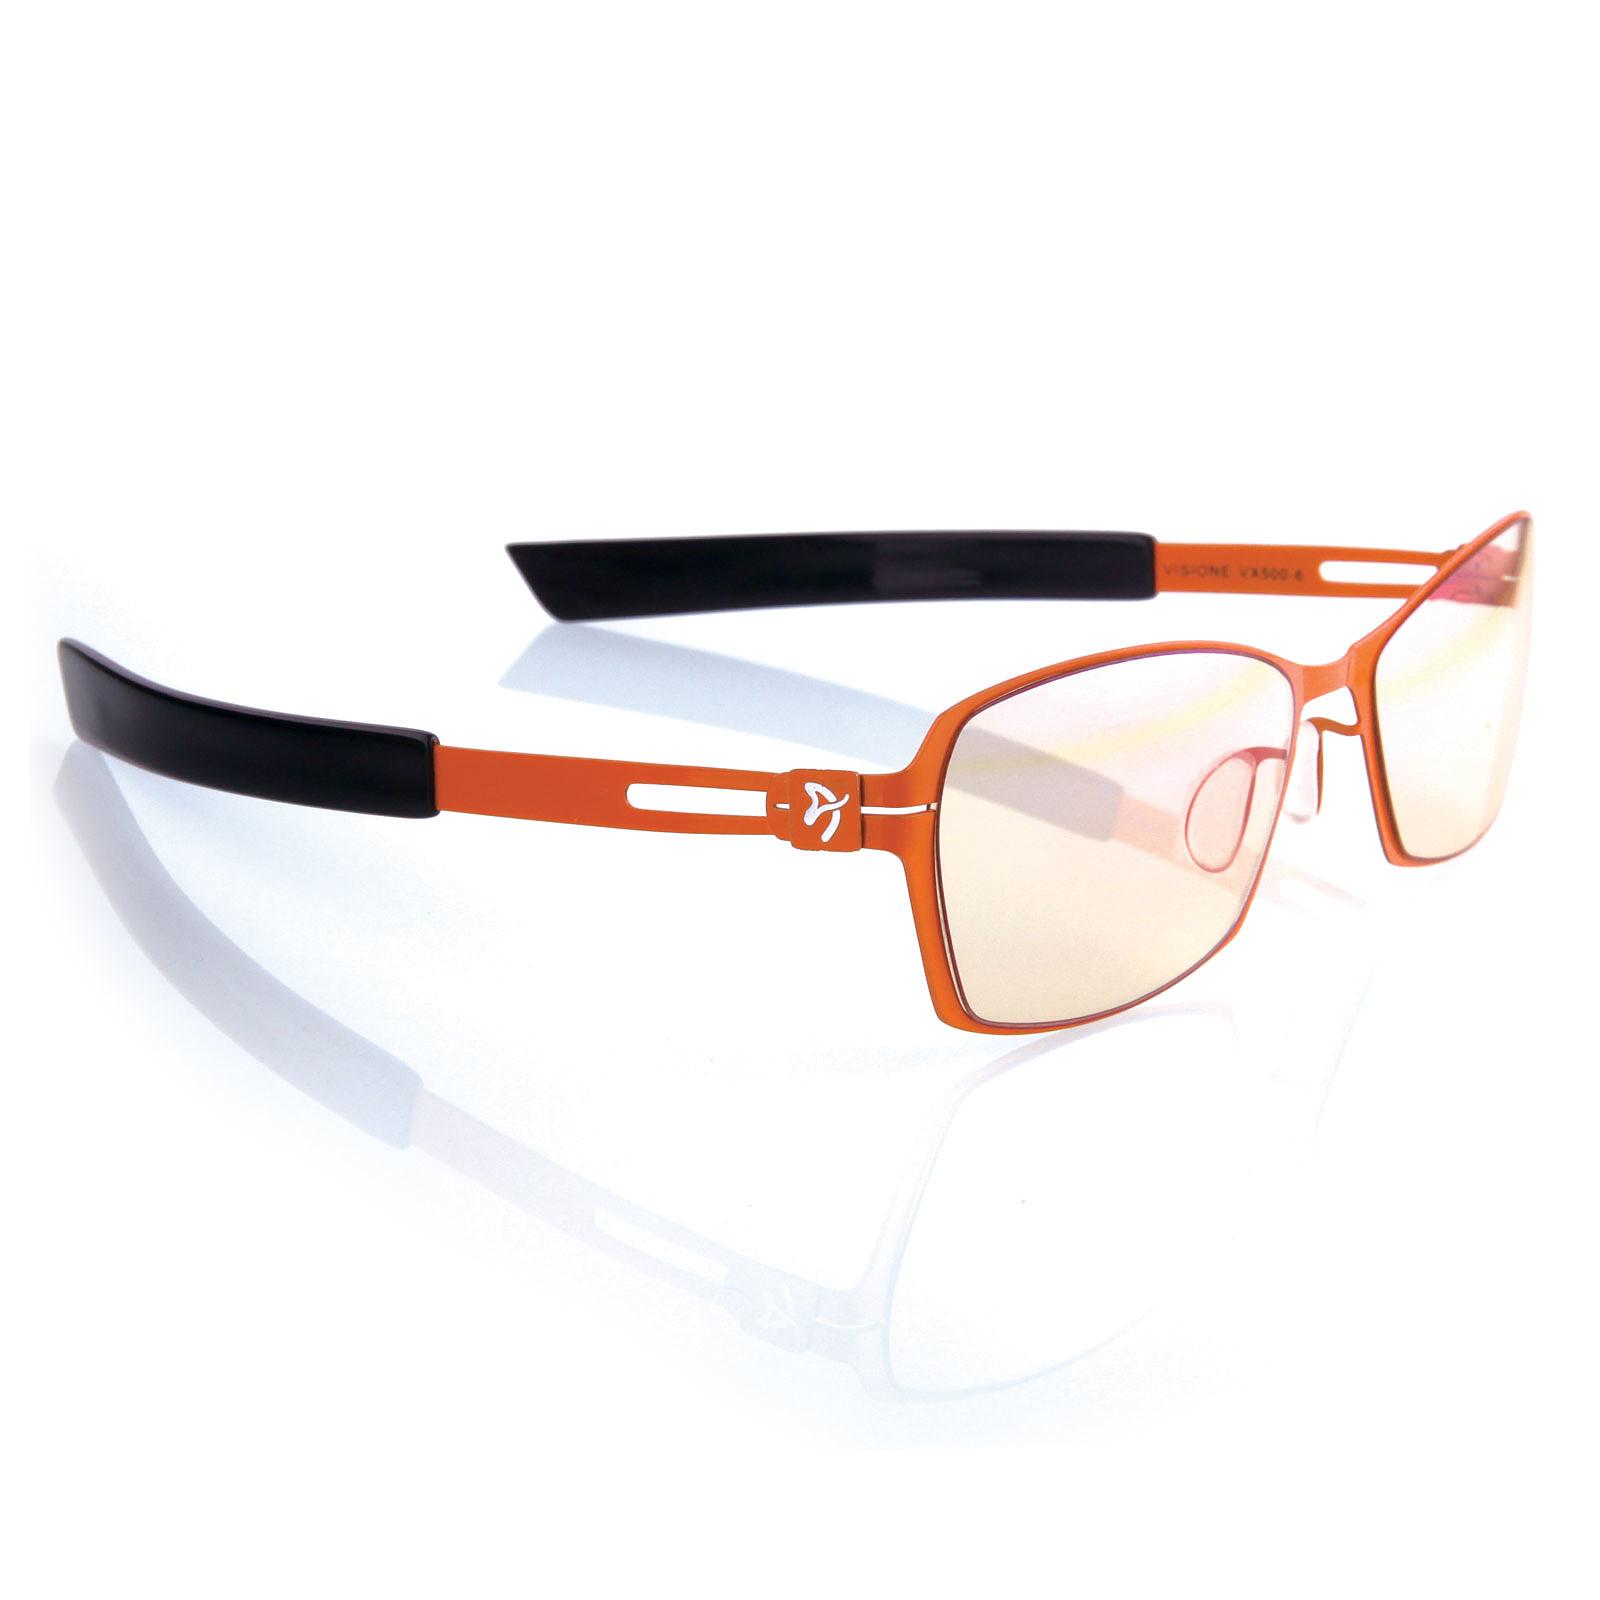 Arozzi Visione VX-500 (Orange)